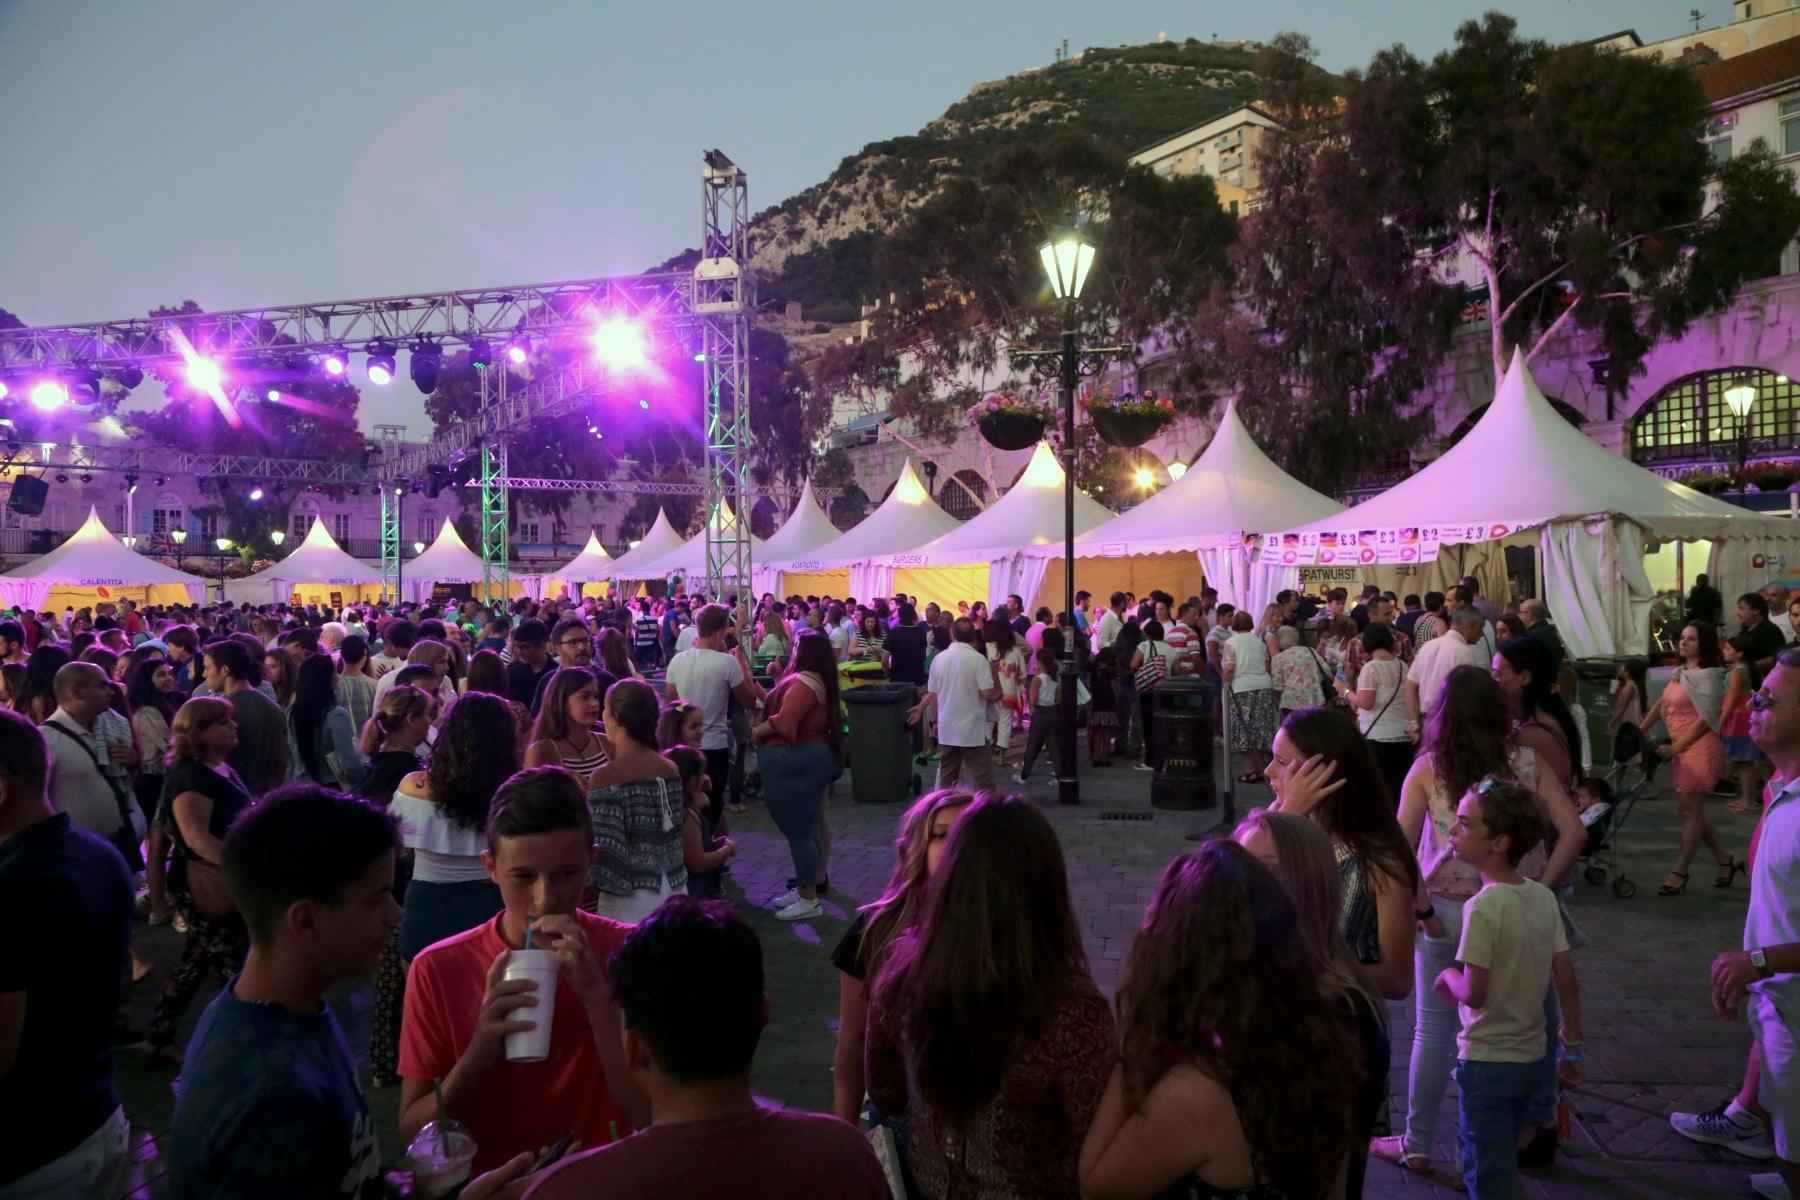 18-jun-2016-noche-de-la-calentita-en-gibraltar_27732684382_o